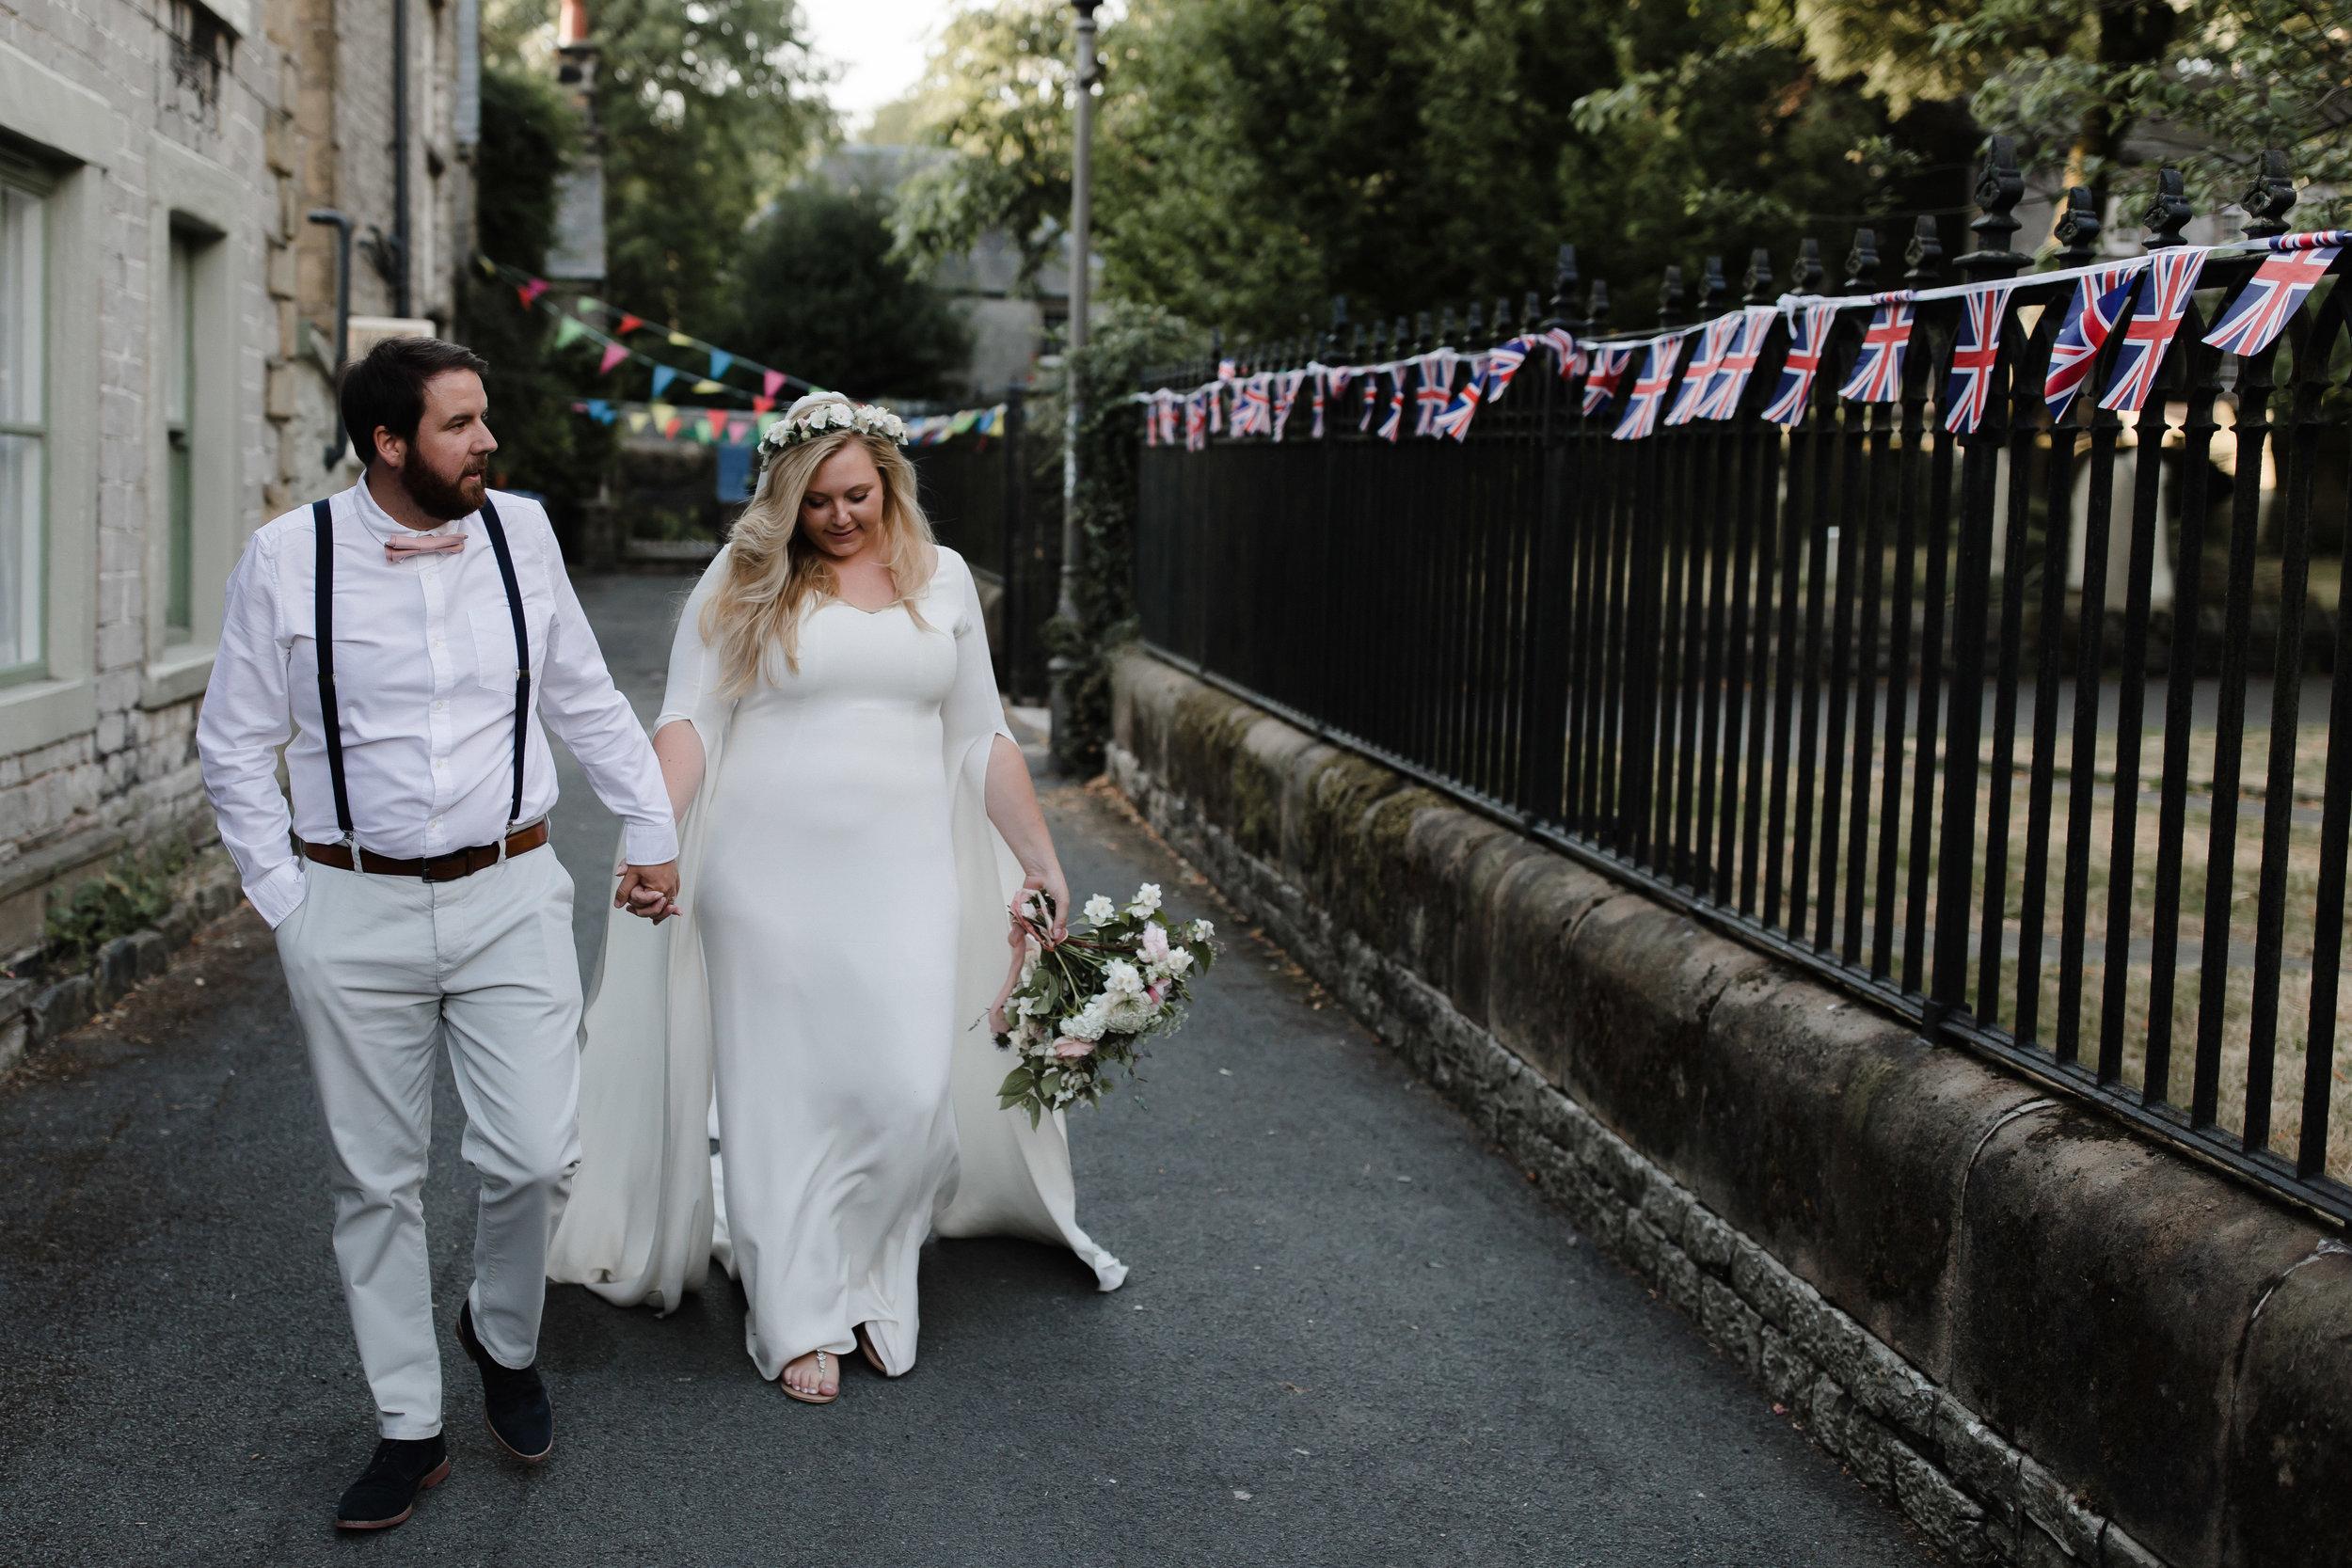 Lauren-Peak-District-Bespoke-Wedding-Gown-Petal-Veil-Train-Long-Sleeve-Susanna-Greening-Designs-Matlock-Derbyshire-2